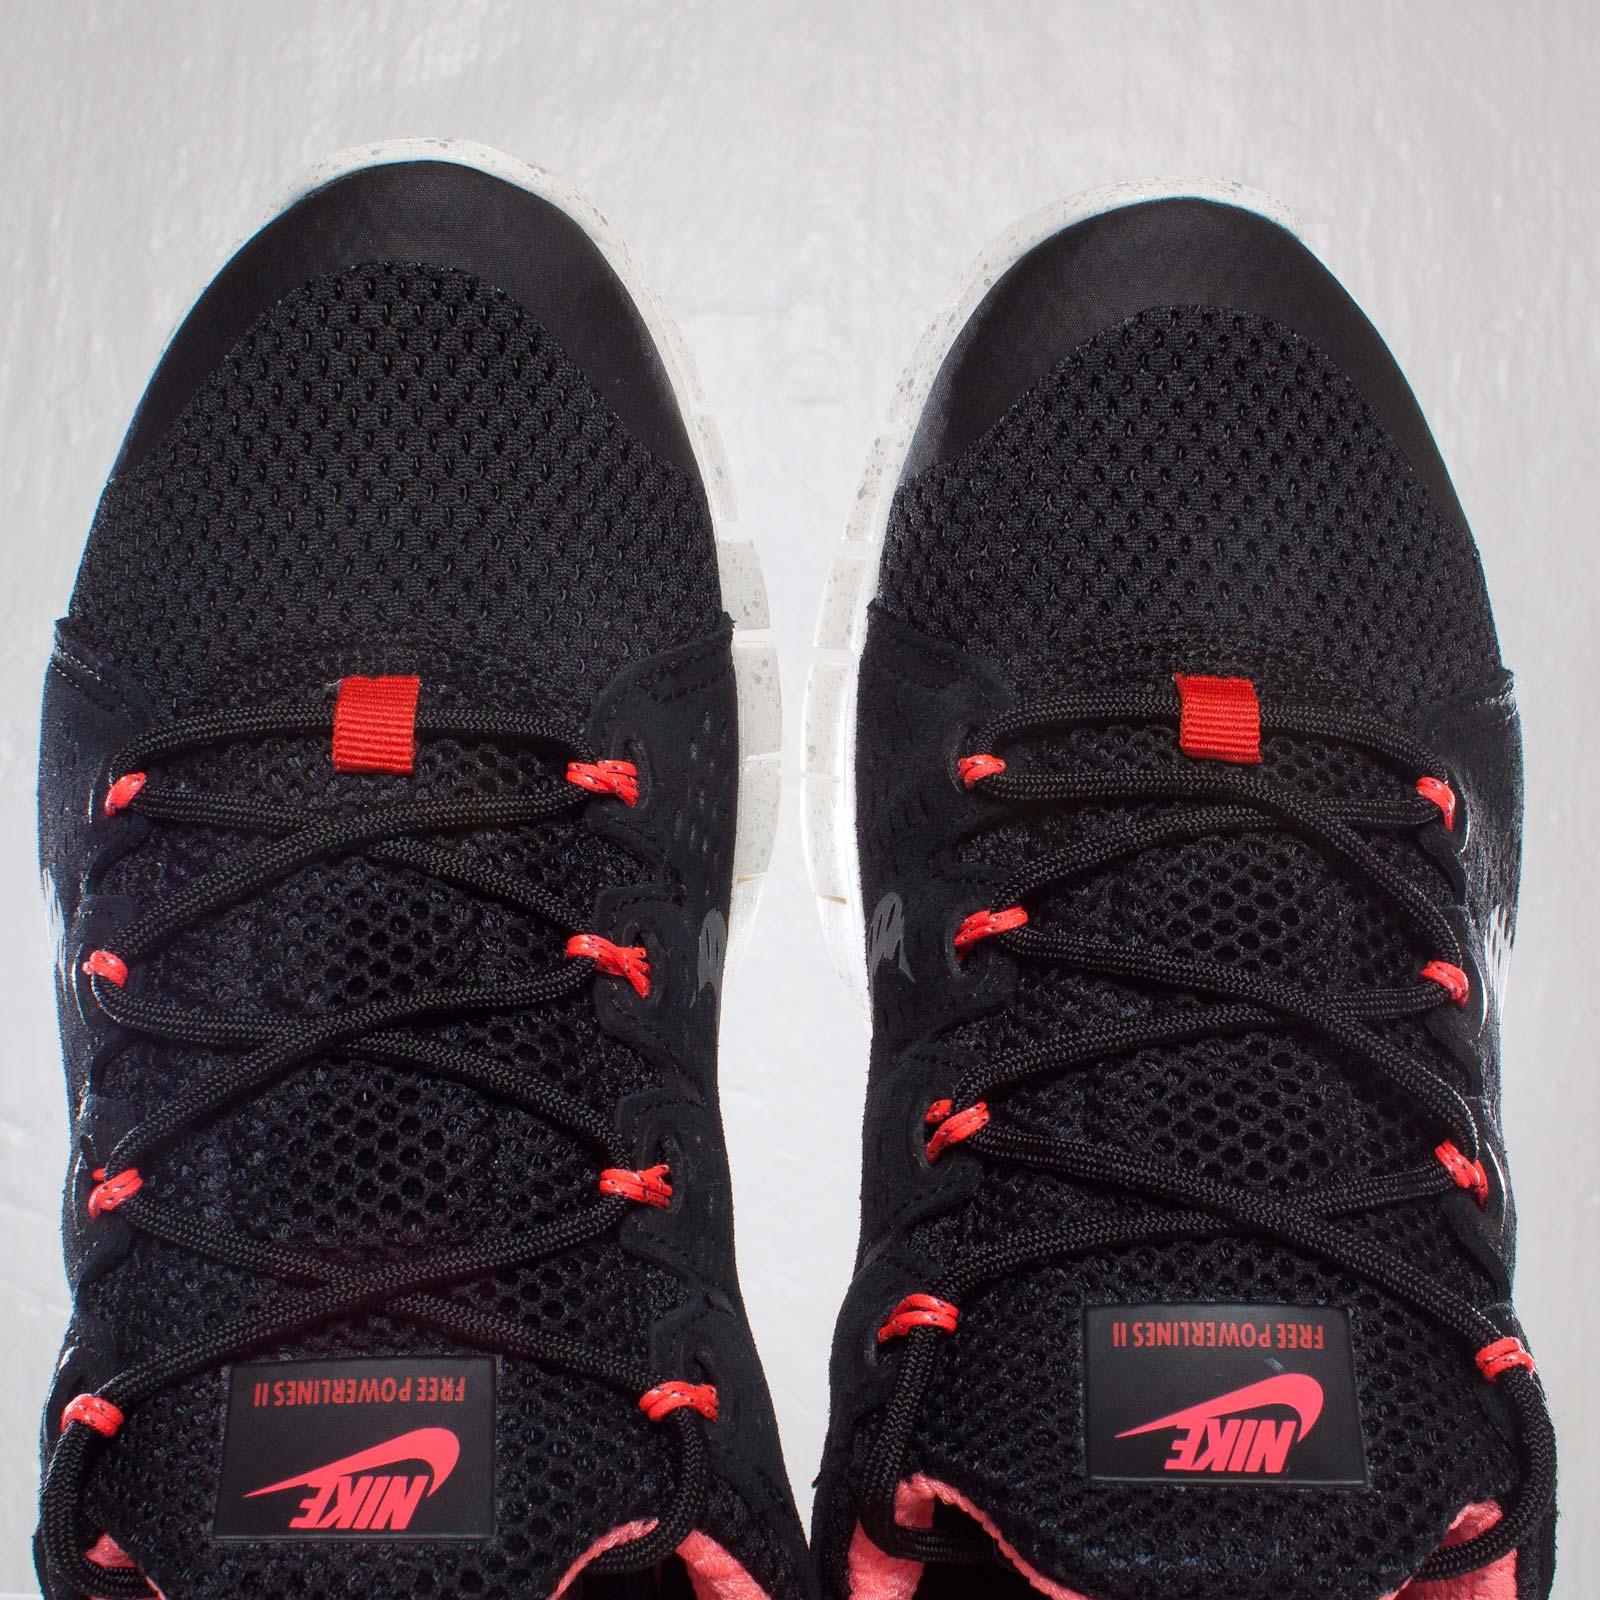 b7fa5e01b7cb Nike Free Powerlines II LTR - 599476-001 - Sneakersnstuff